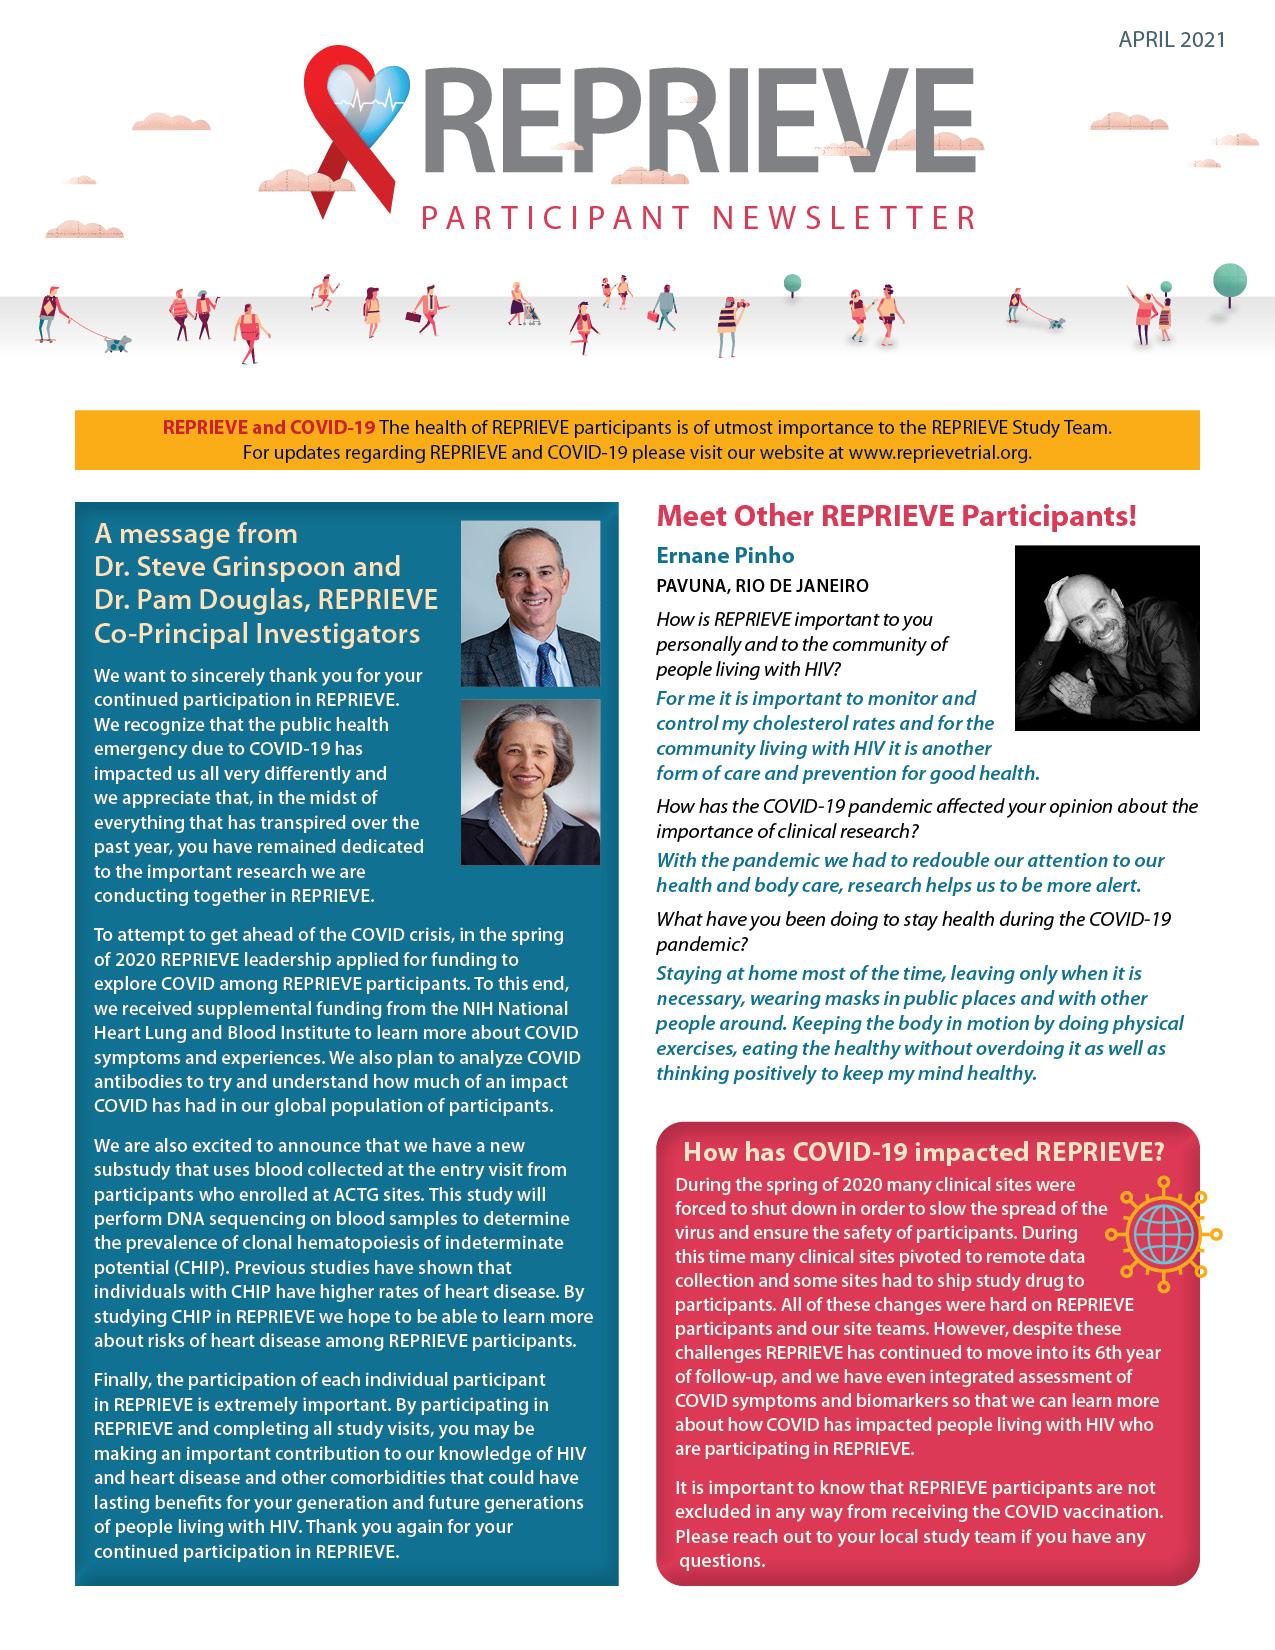 REPRIEVE Participant Newsletter 2021 ENGLISH FRONT